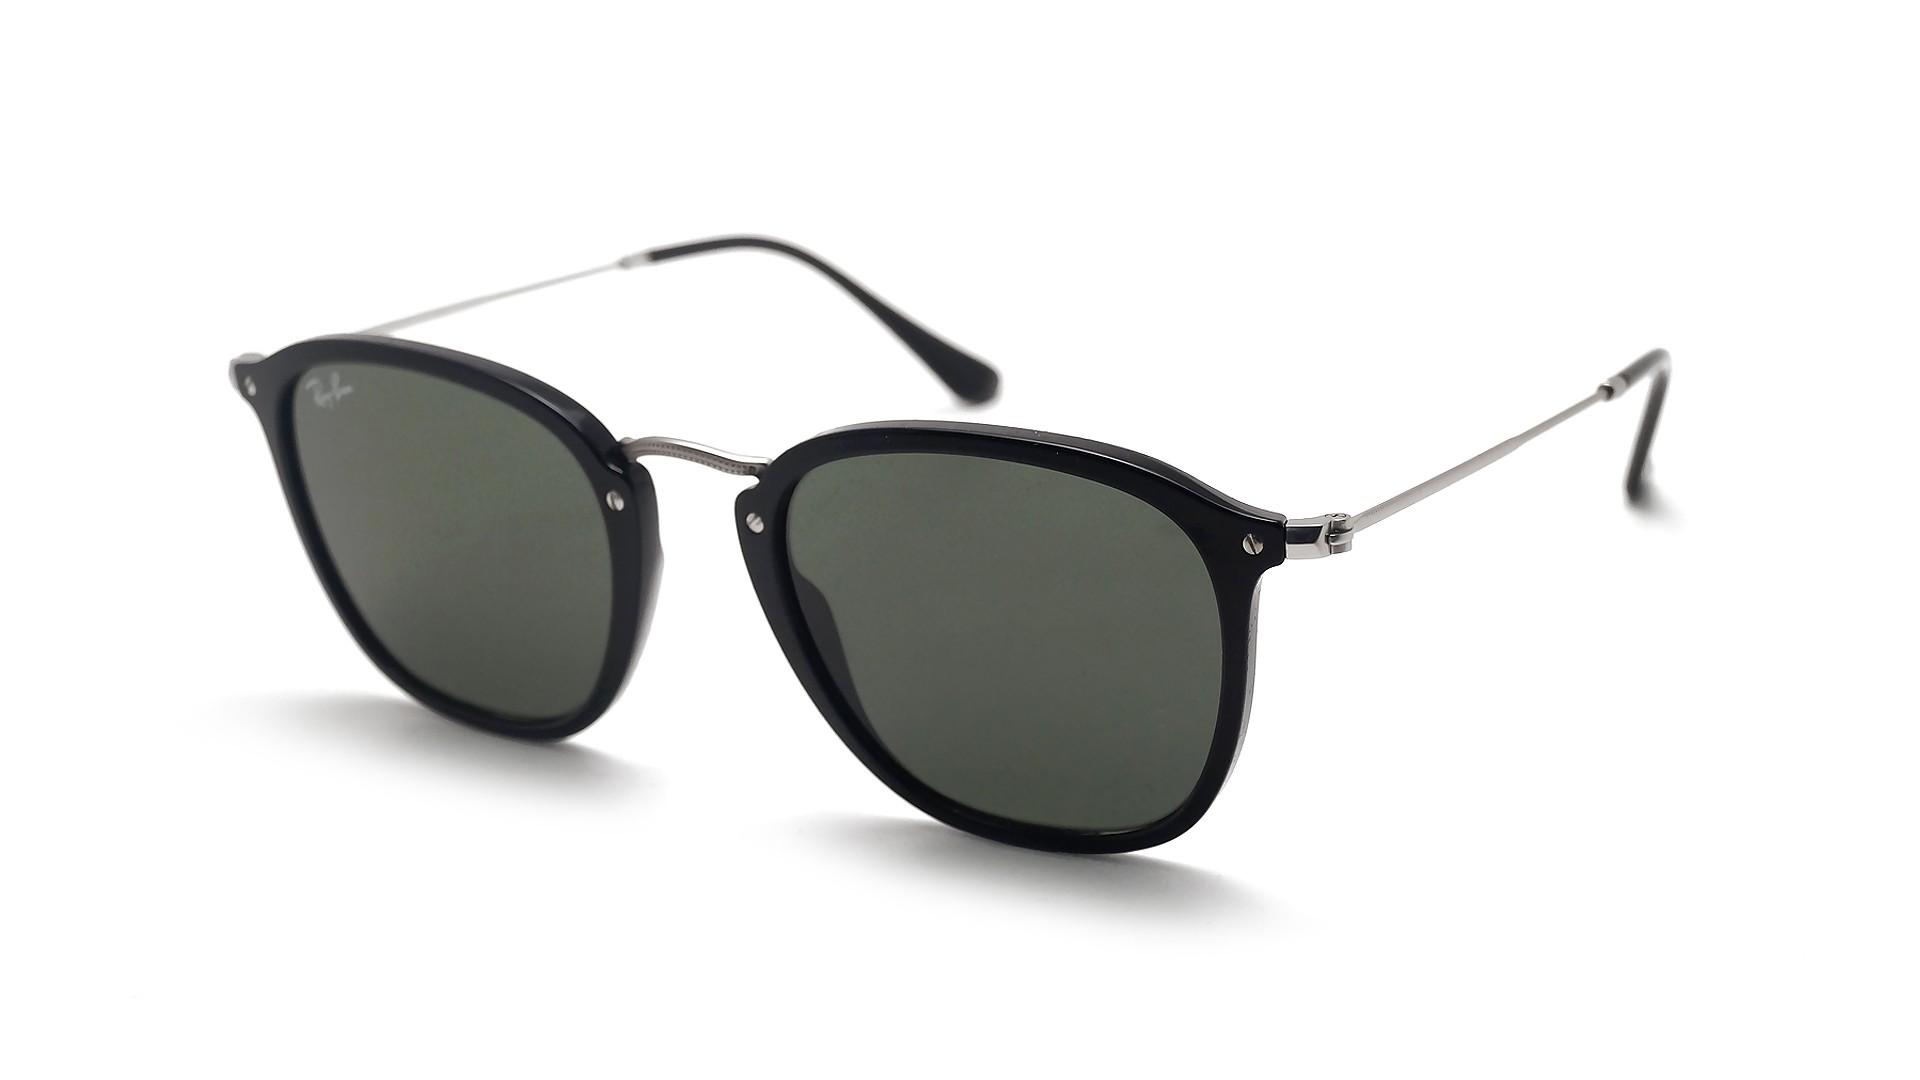 2a5f902cdcb19 Sunglasses Ray-Ban RB2448N 901 51-21 Black G-15 Flat Lenses Medium